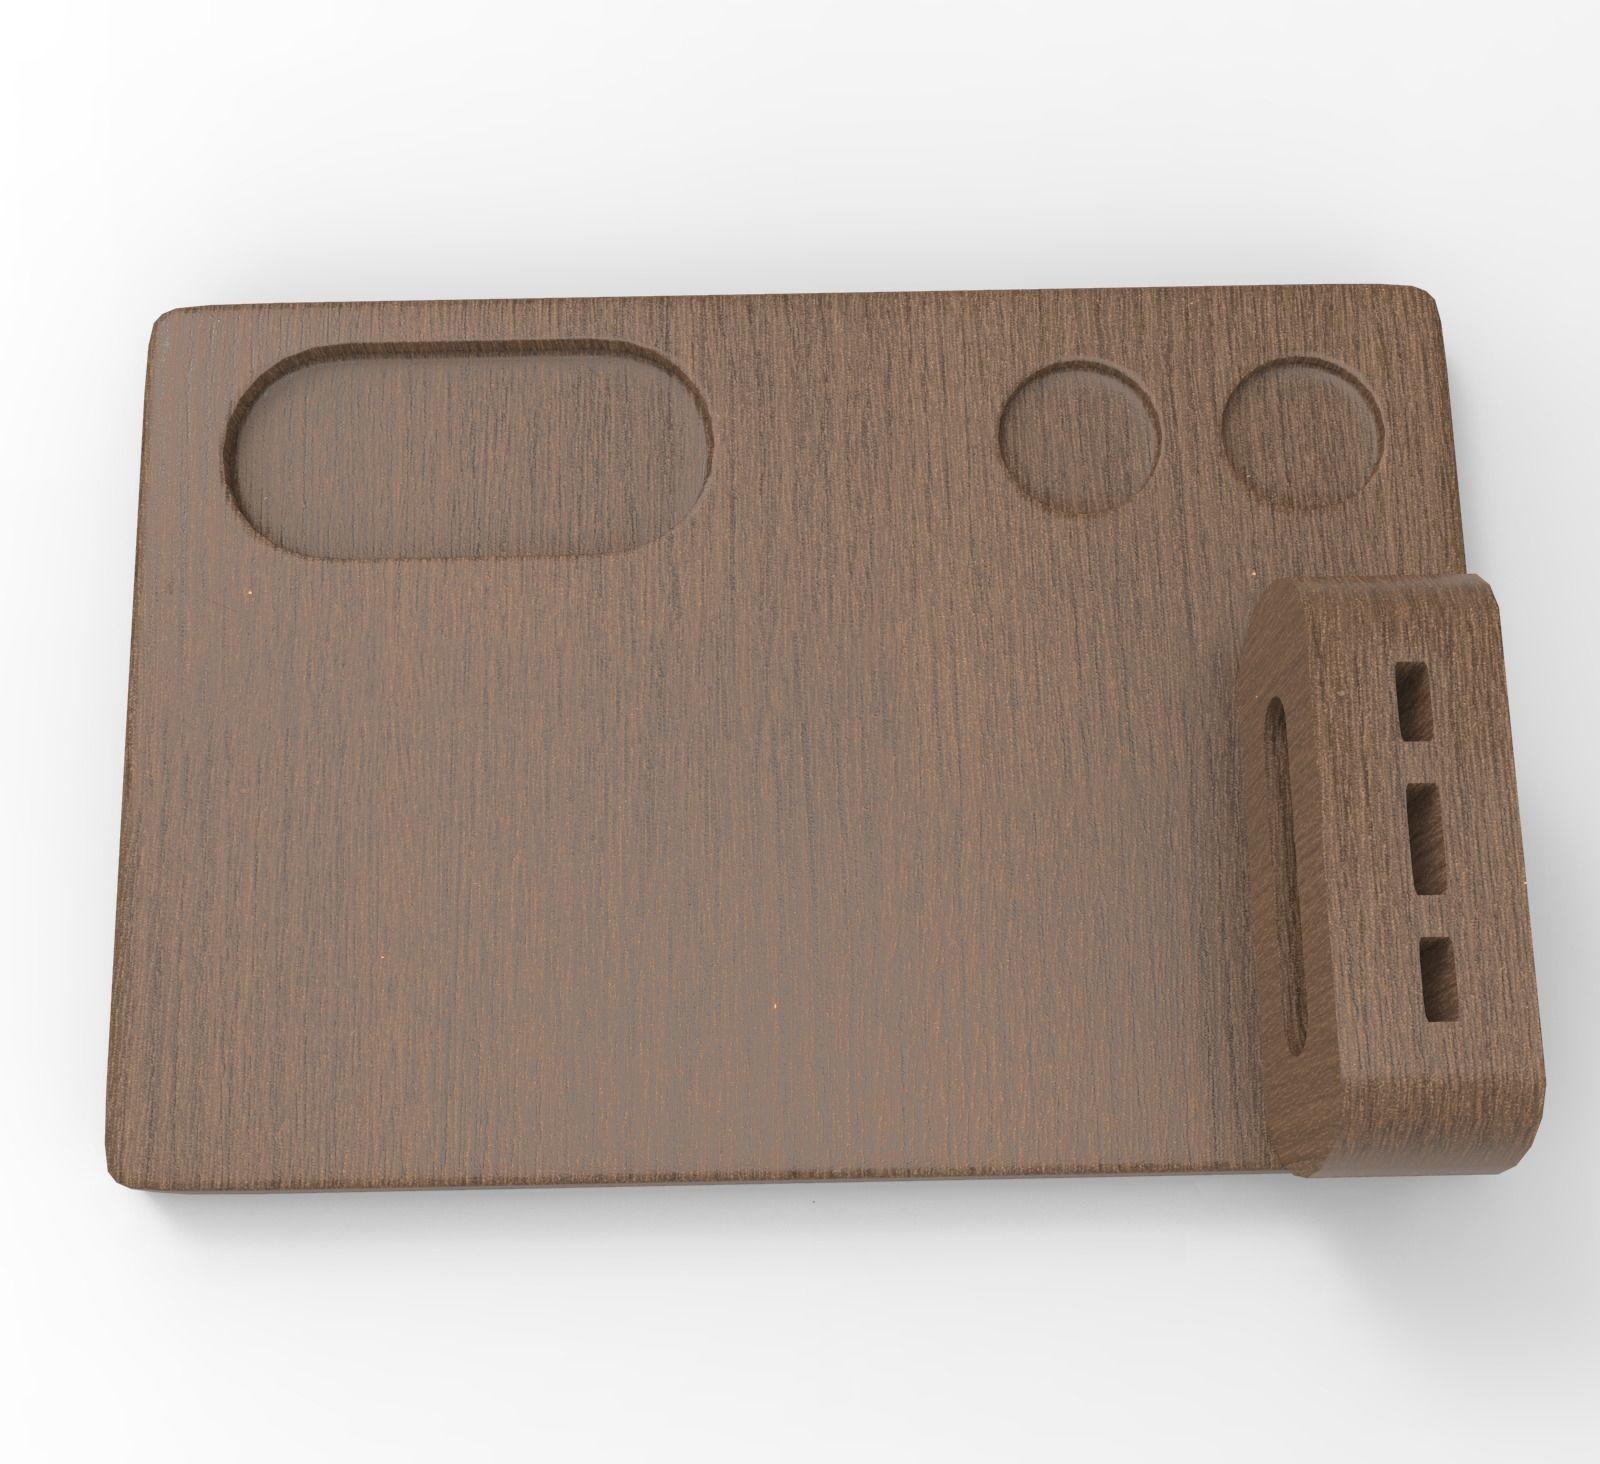 Wood Wooden Chopping Cutting Board 3D Model